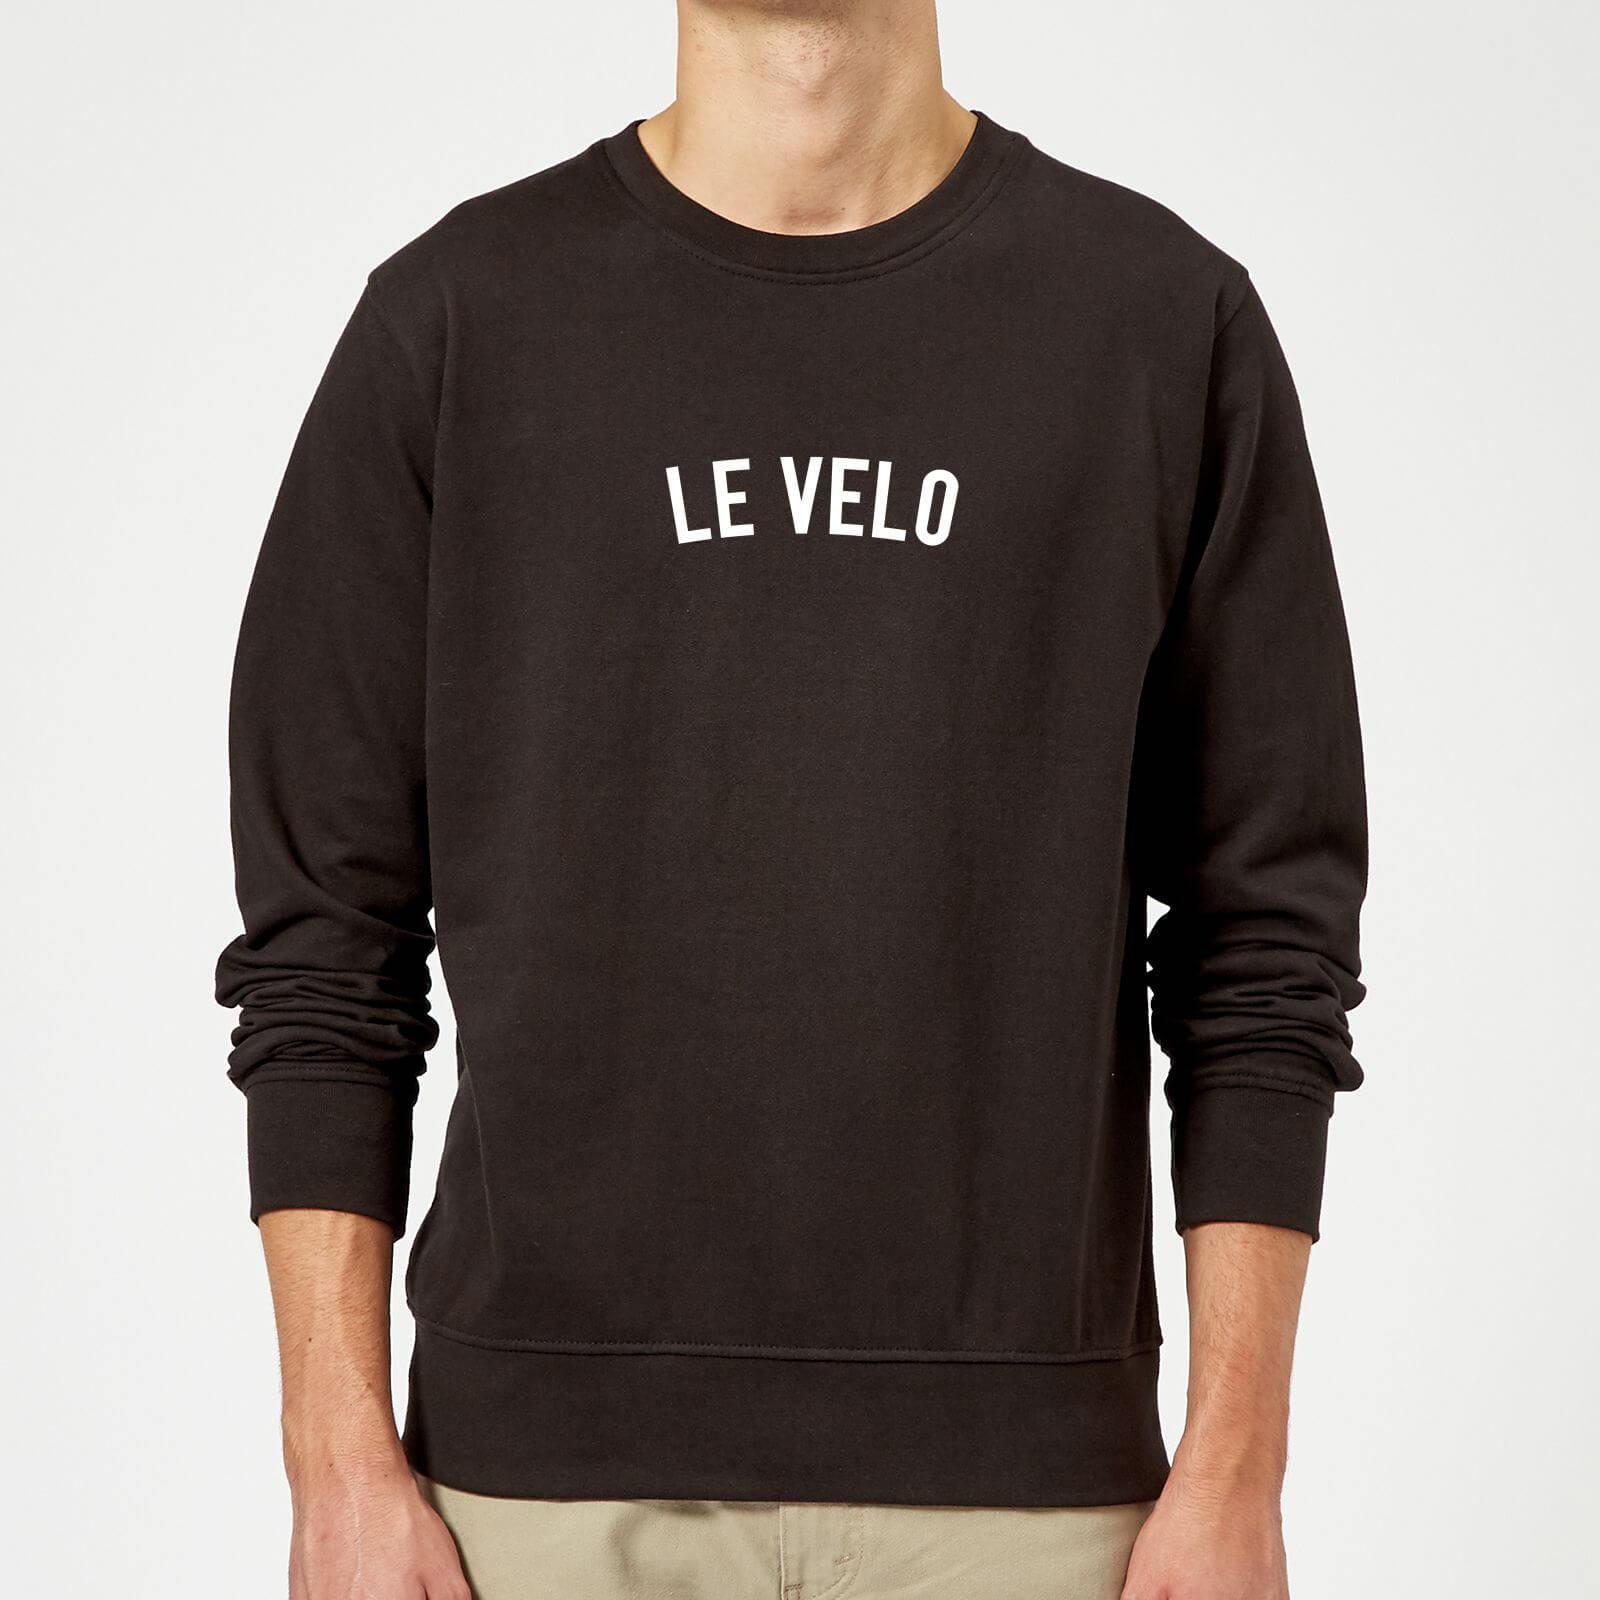 Le Velo Sweatshirt - XL - Grey